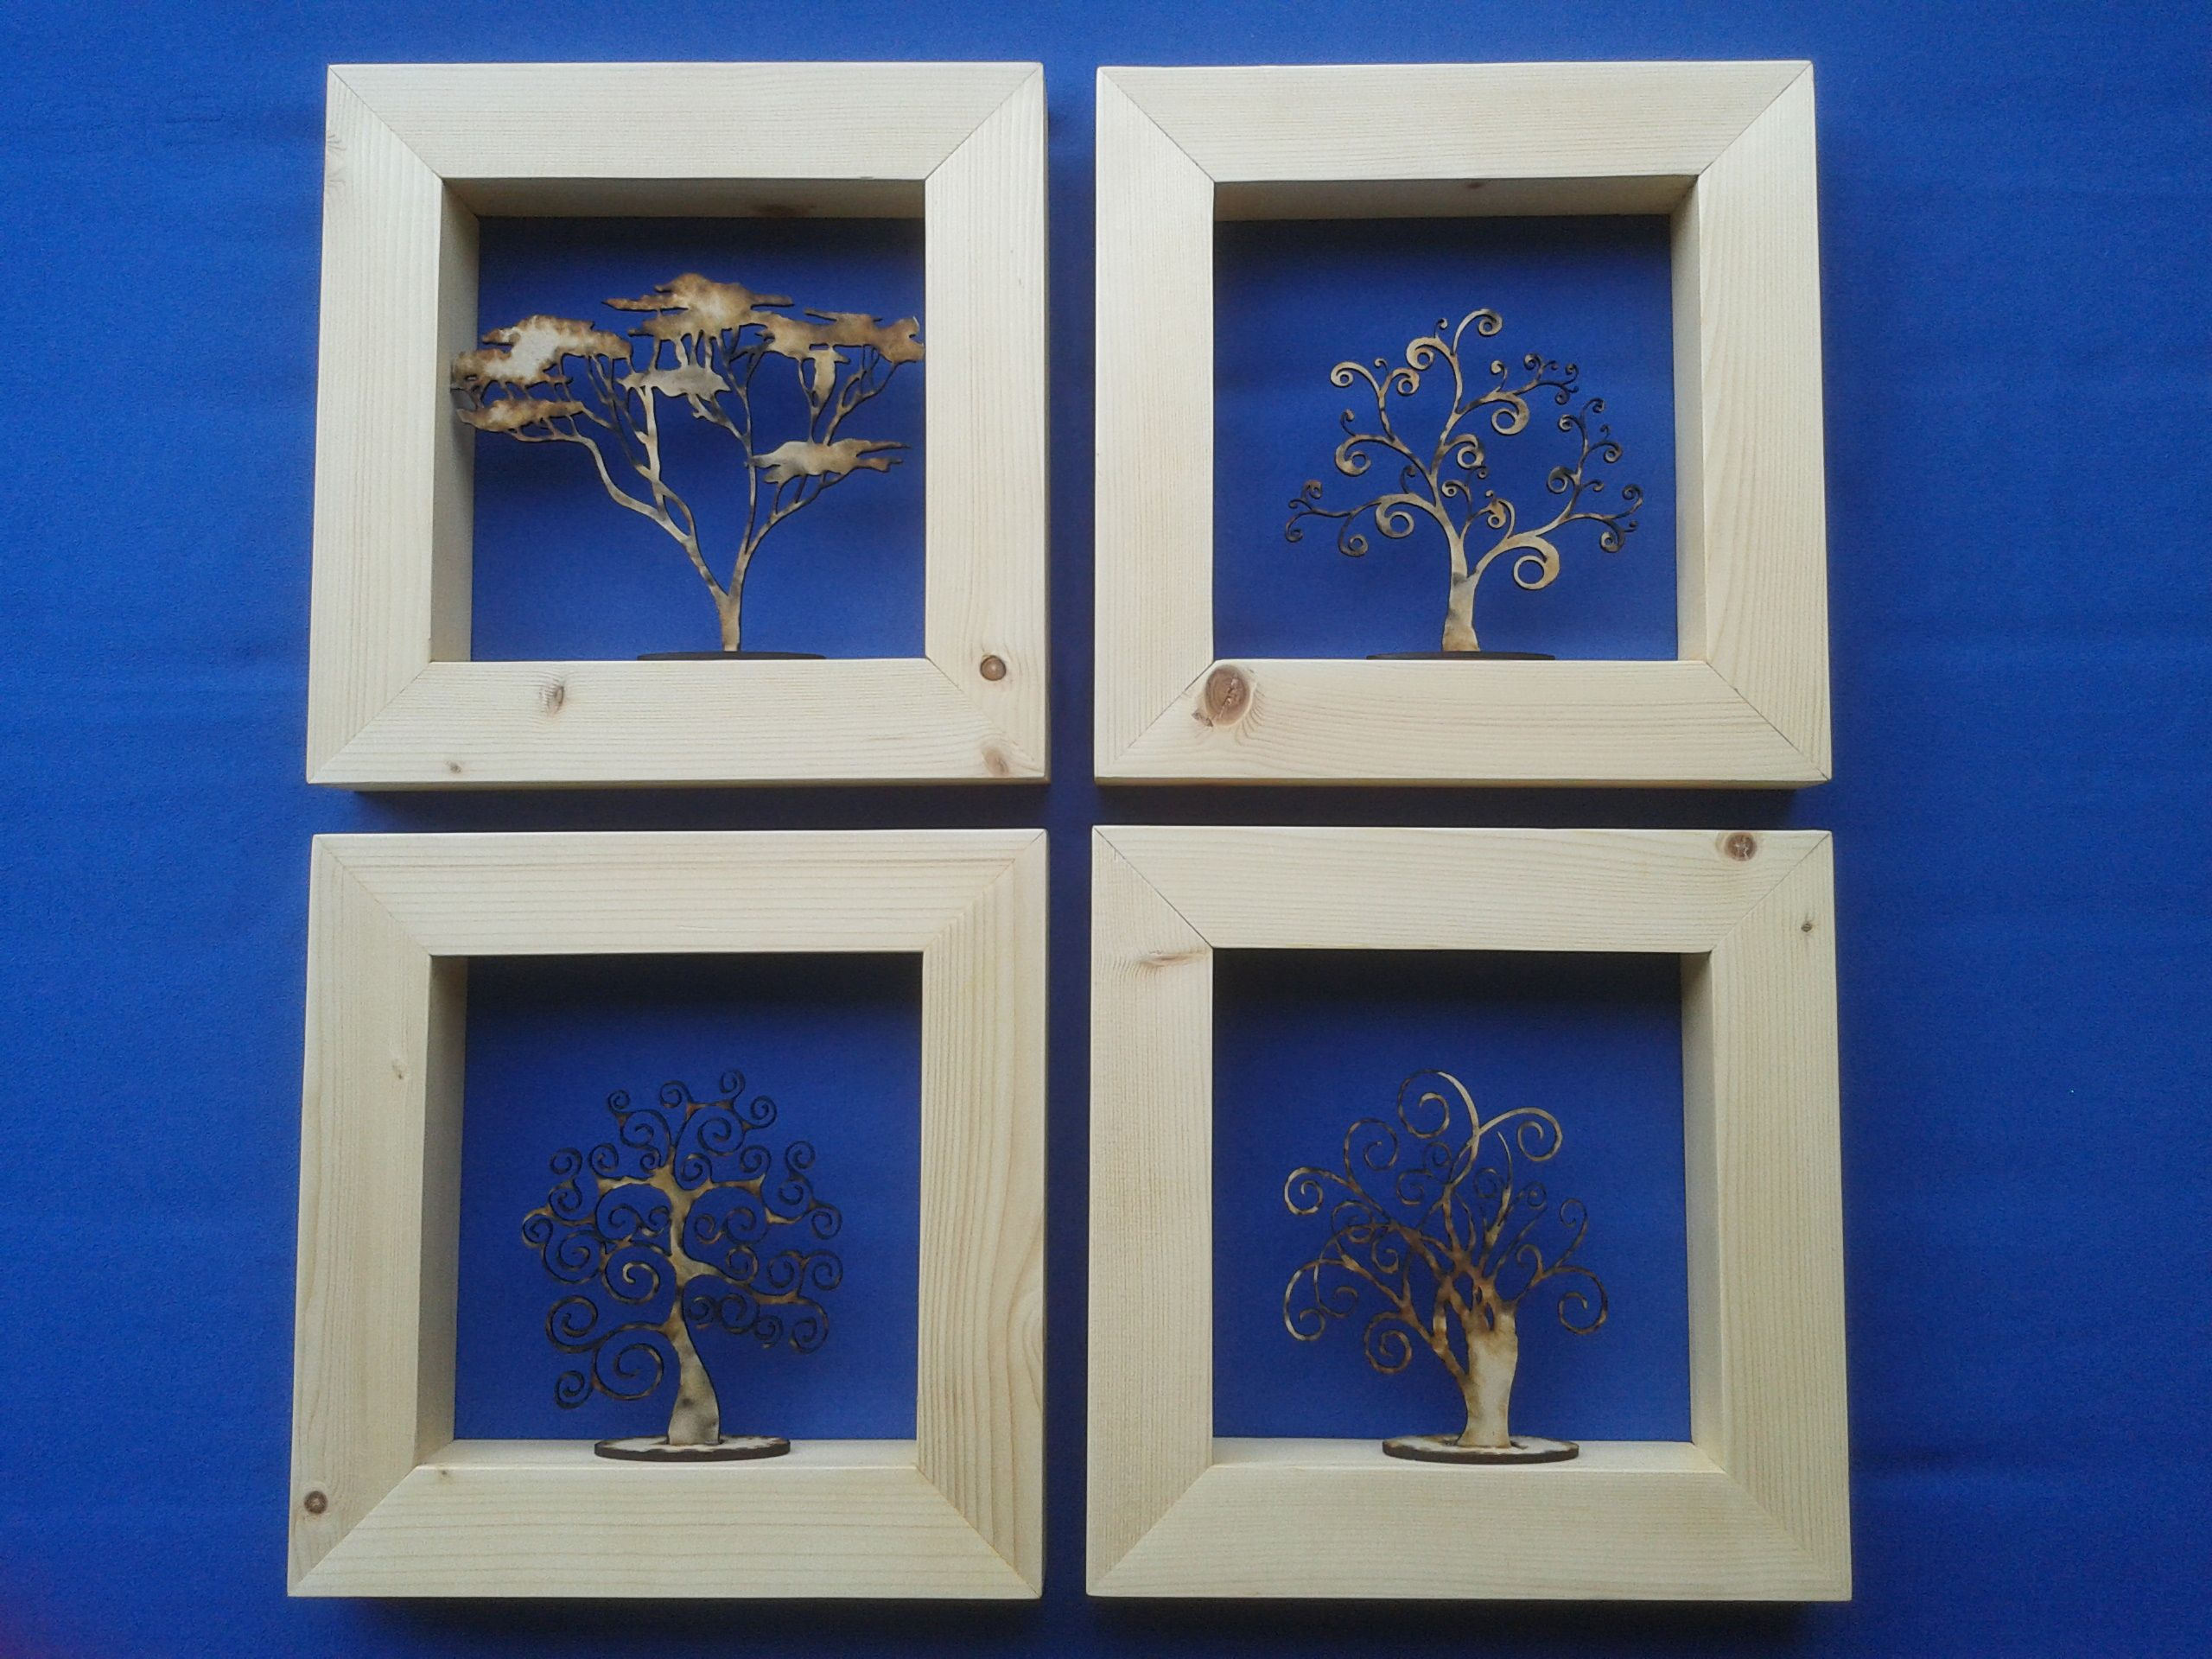 Http hand cuadros sin fondo con marco de madera - Cuadros sin marco ...